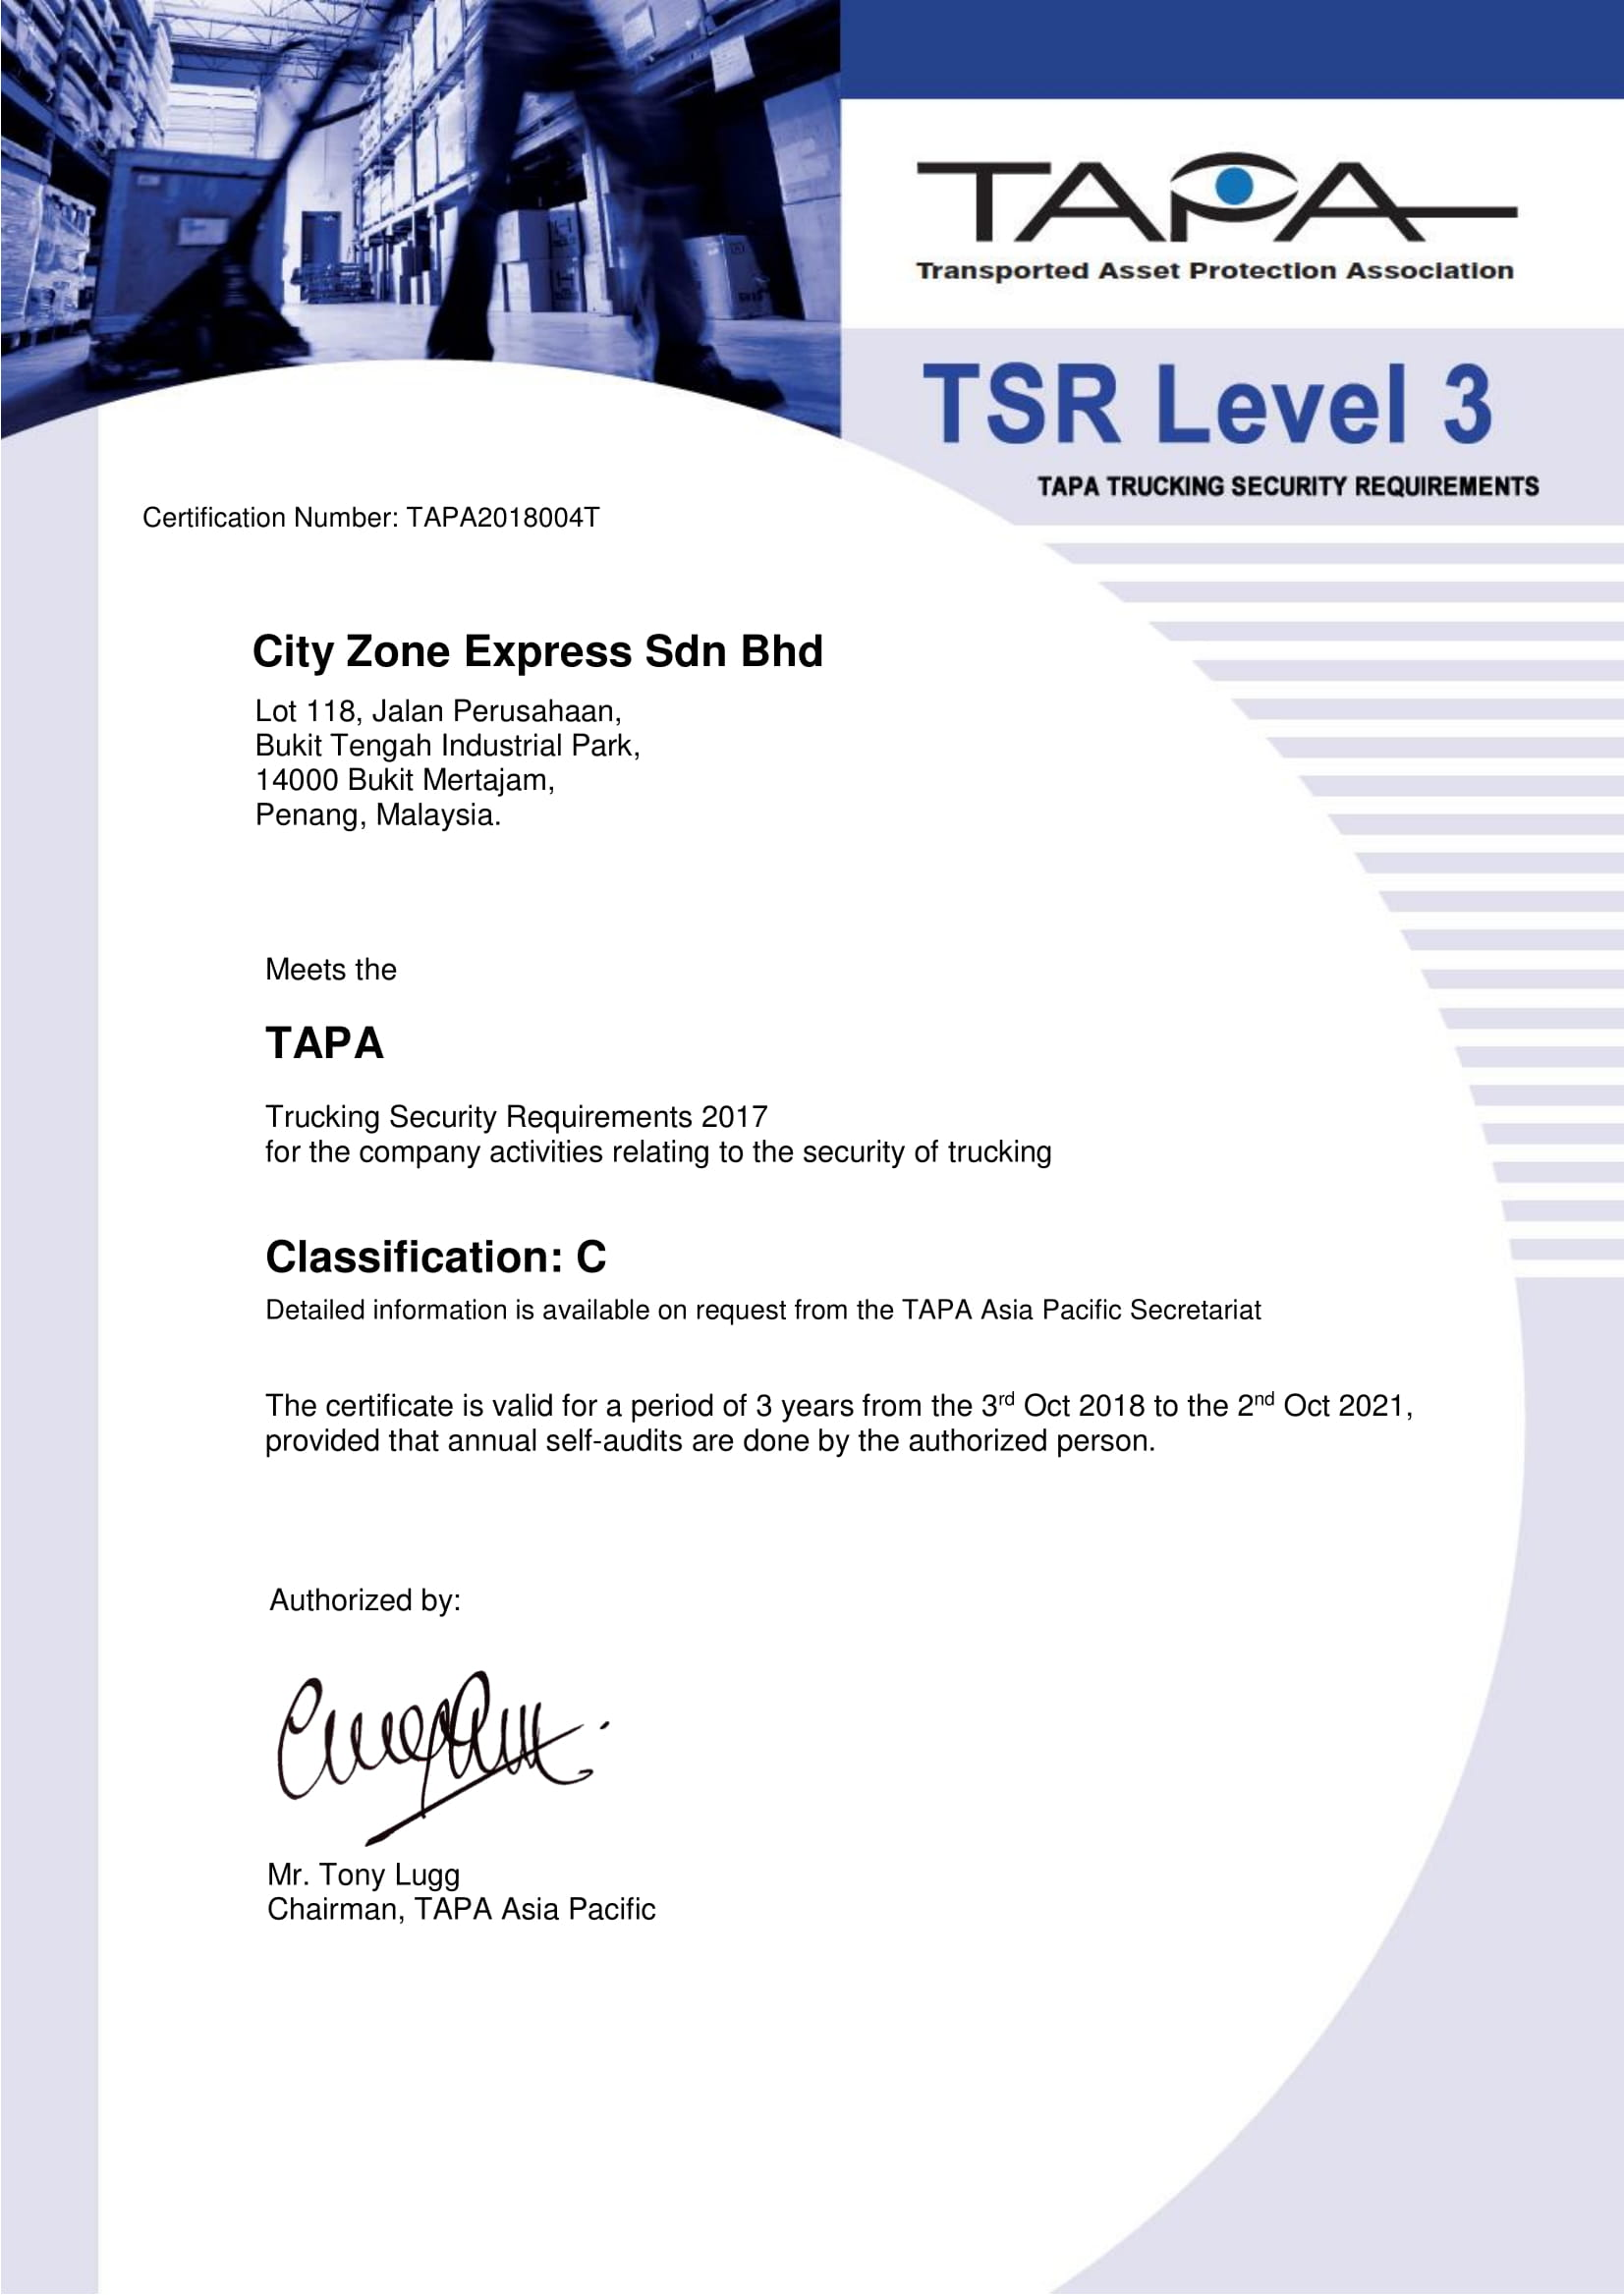 TAPA2018004T - City Zone Express Sdn Bhd-1